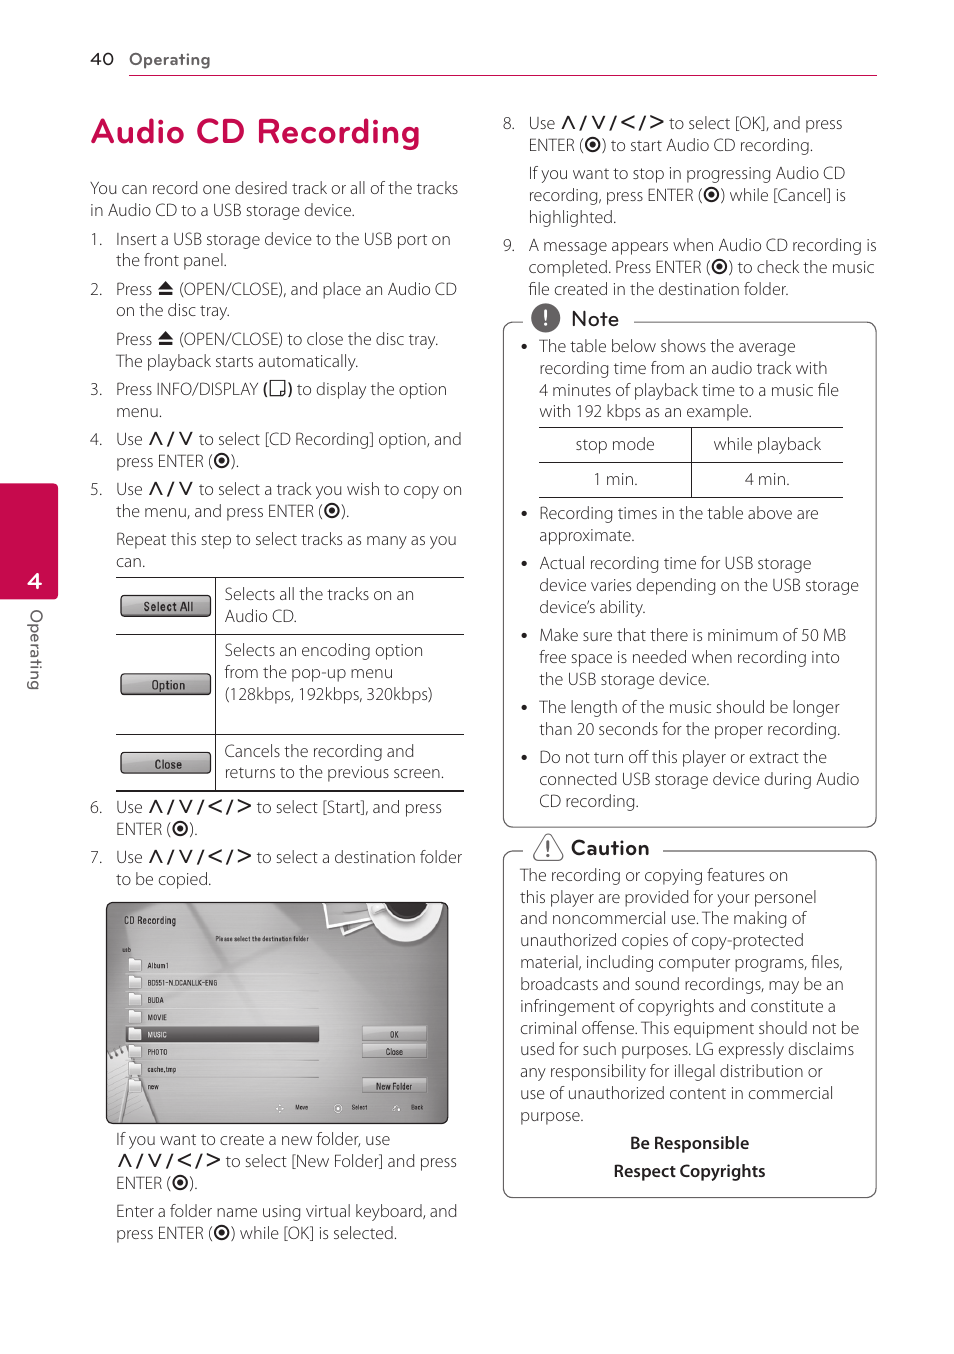 audio cd recording lg bd645 user manual page 40 56 original mode rh manualsdir com LG Cell Phone Manuals LG Cell Phone Manuals